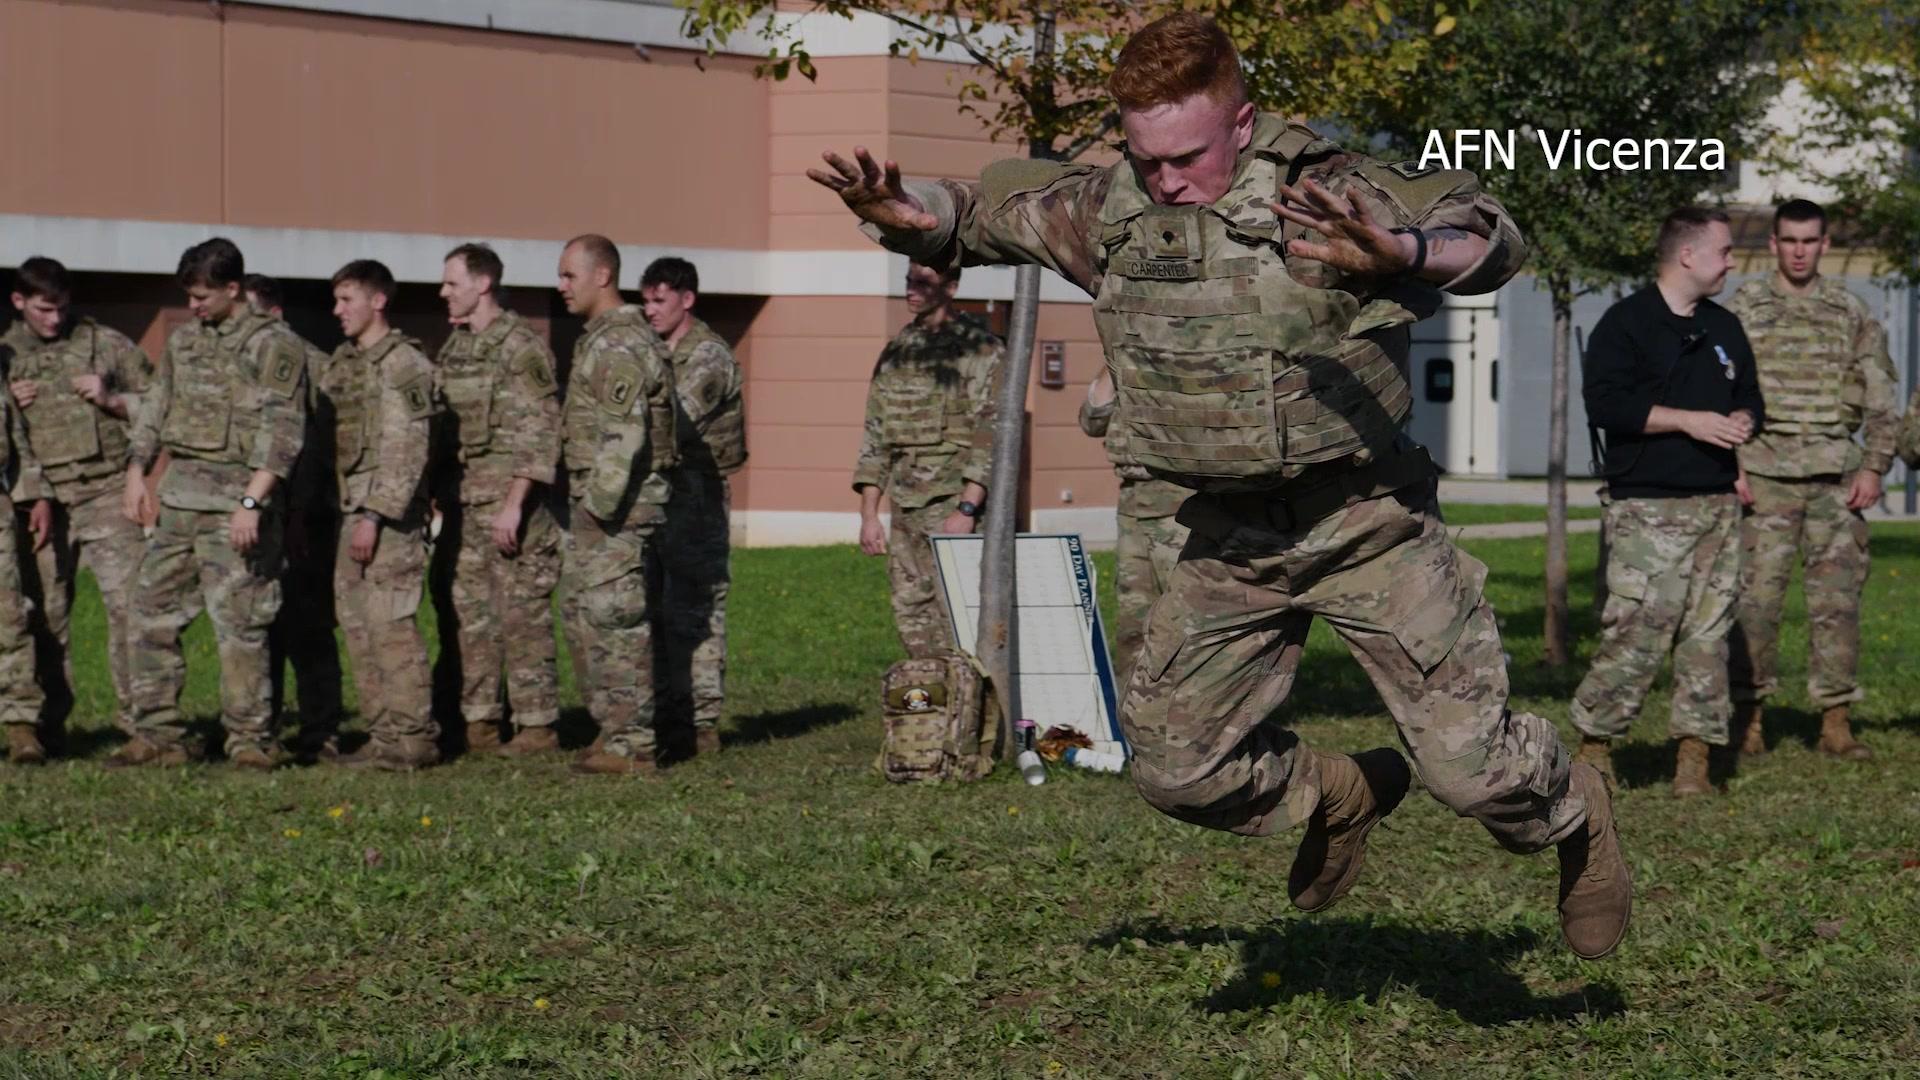 The US Army – 173rd Airborne Brigade Brostrom Challenge 2019